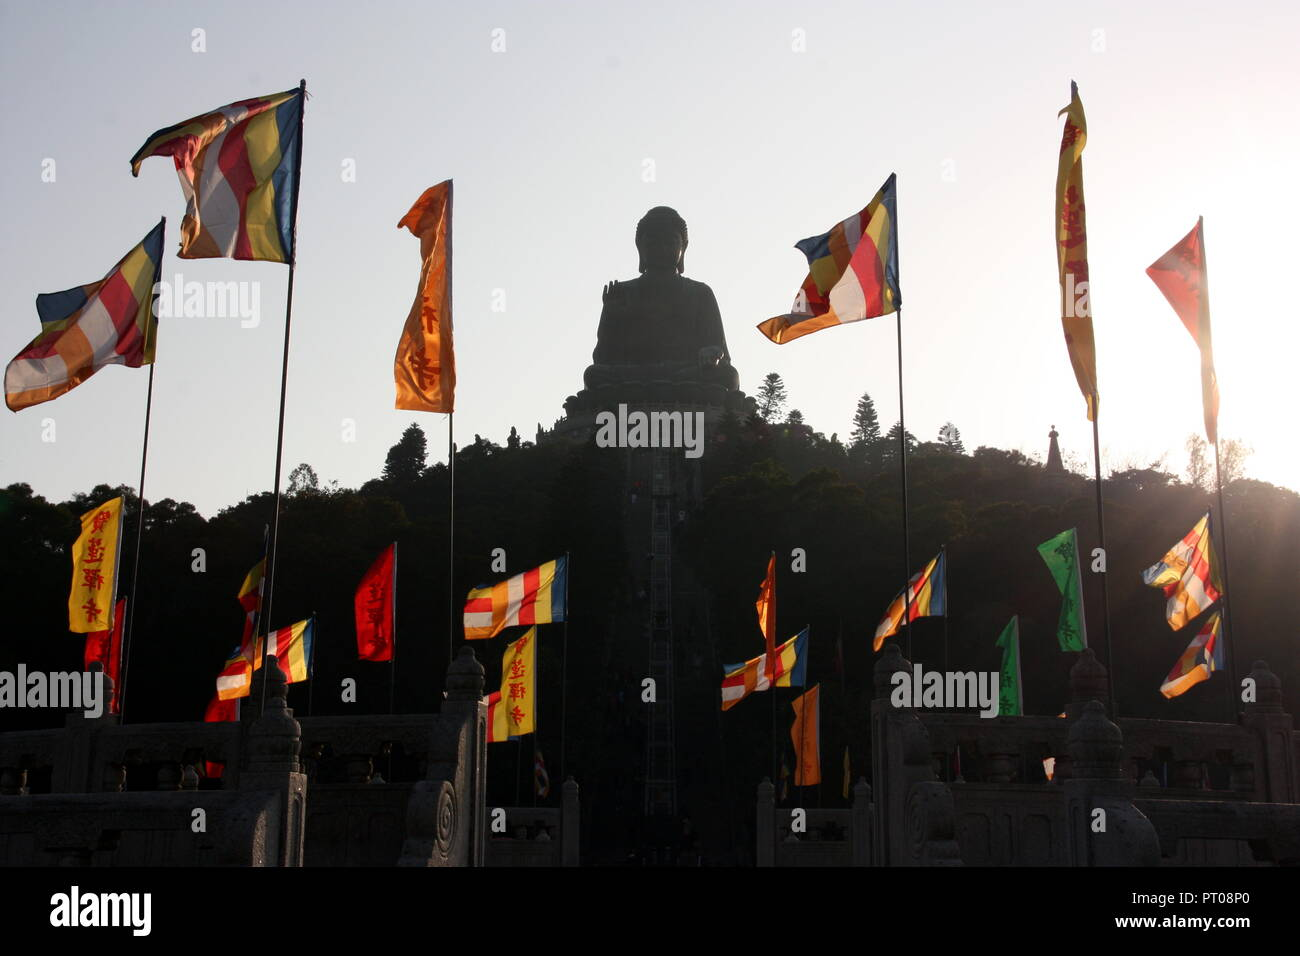 Tian Tan Buddha on Lantau island in Hong Kong - Stock Image